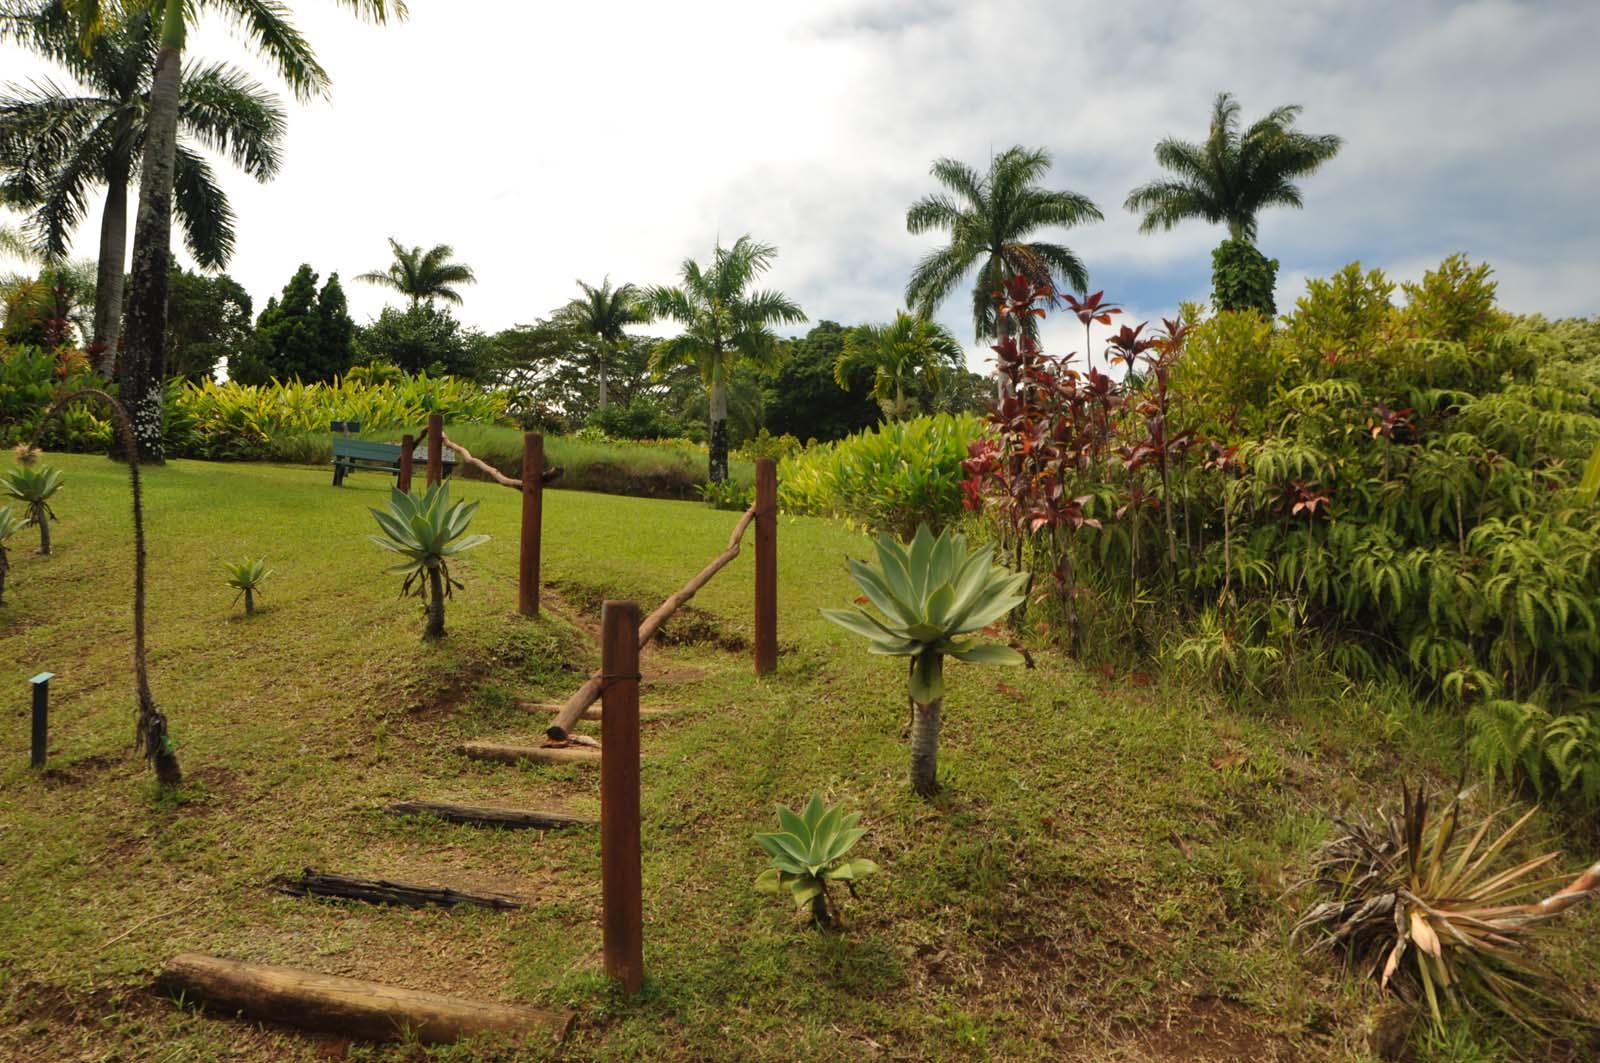 092_maui_hawaii_island